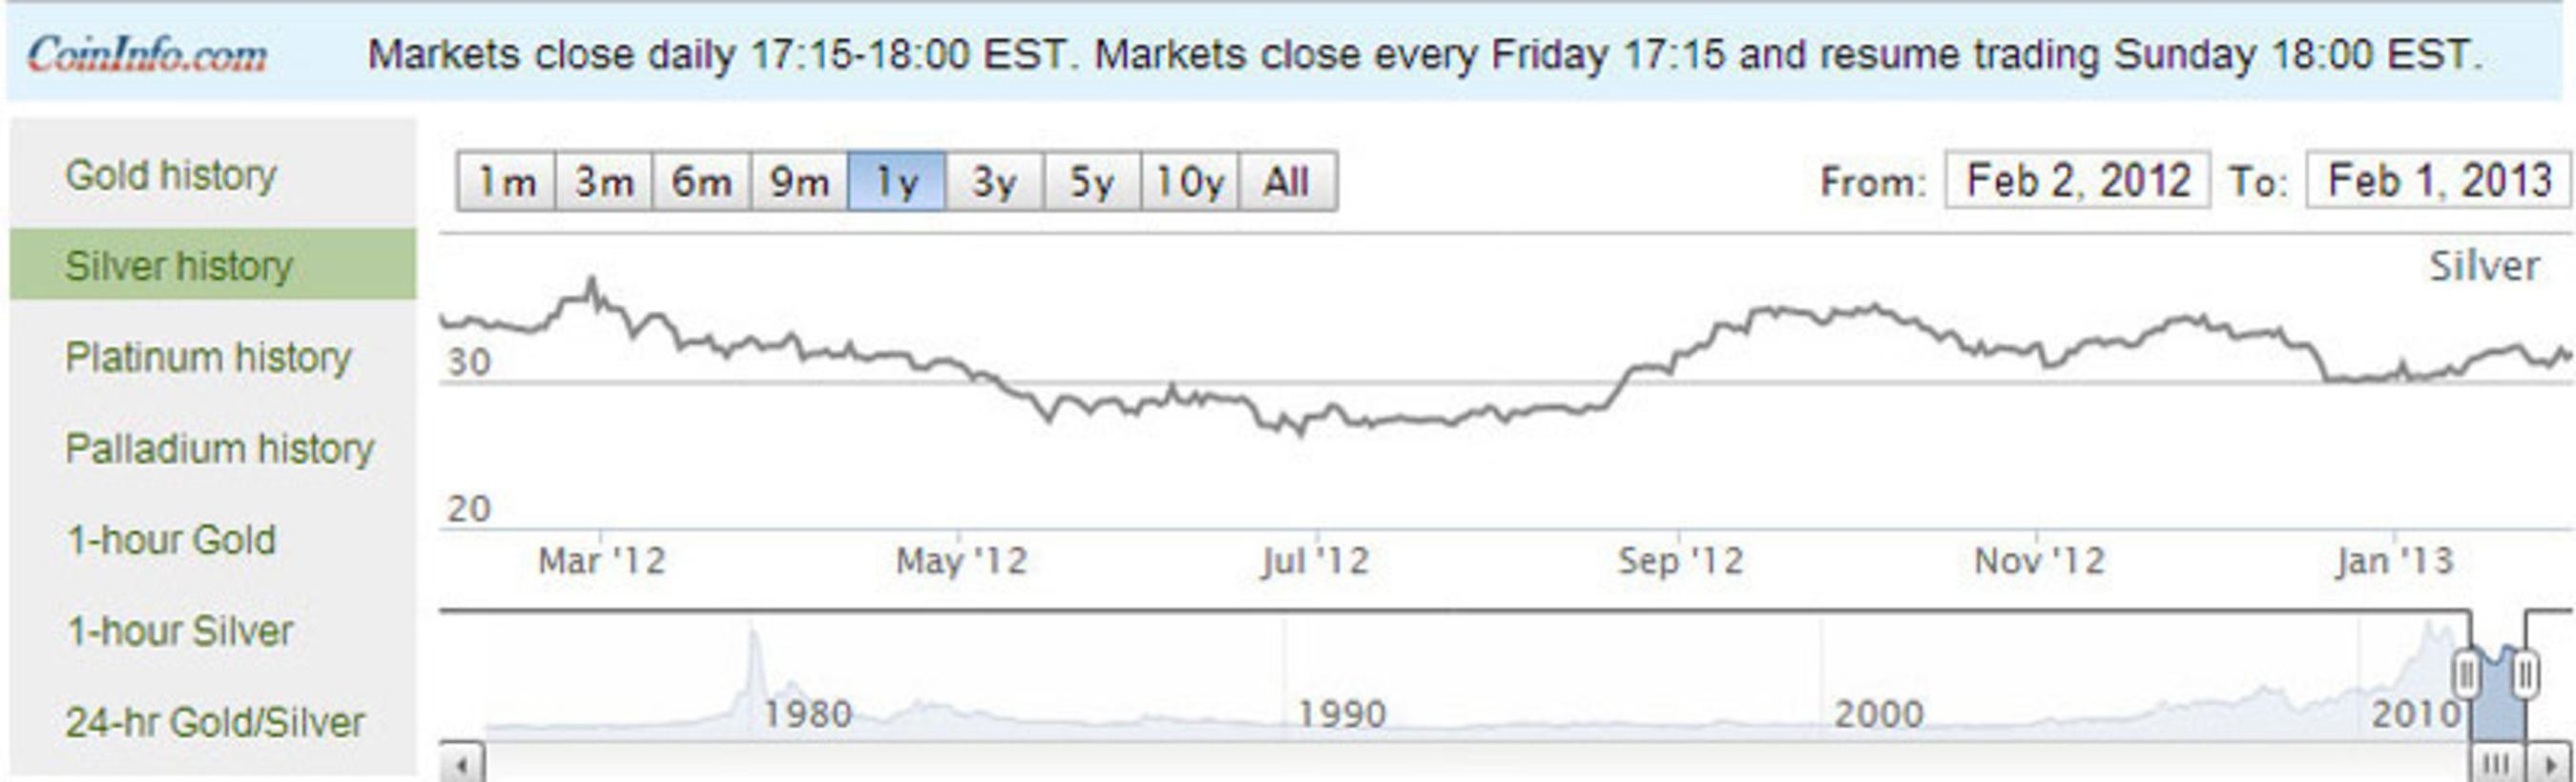 Historical Silver Chart.  (PRNewsFoto/CoinInfo.com)